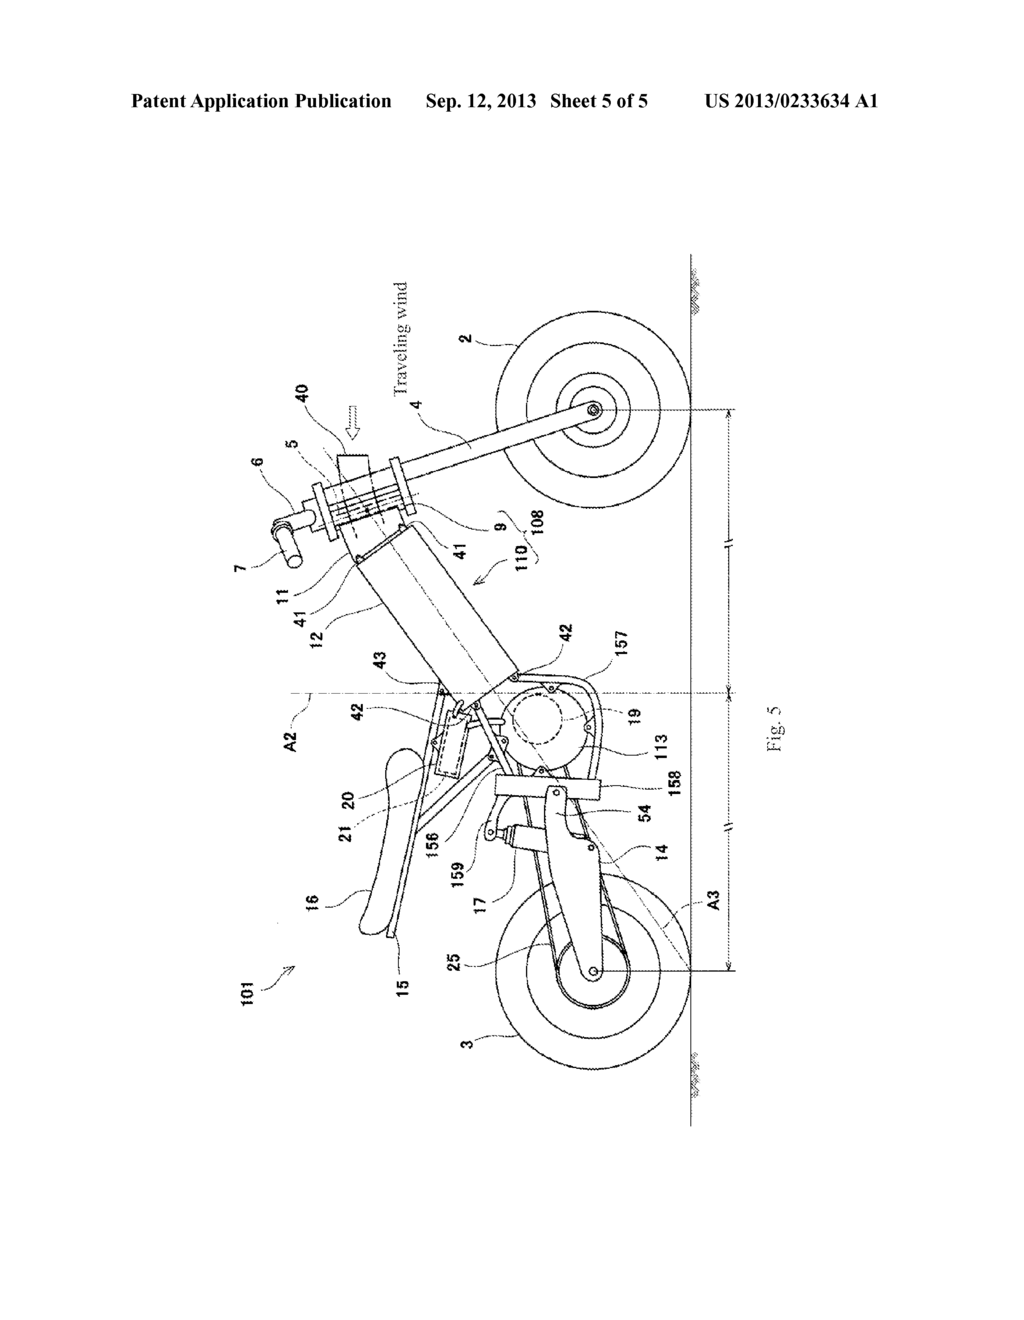 briggs and stratton wiring diagram carlplant html